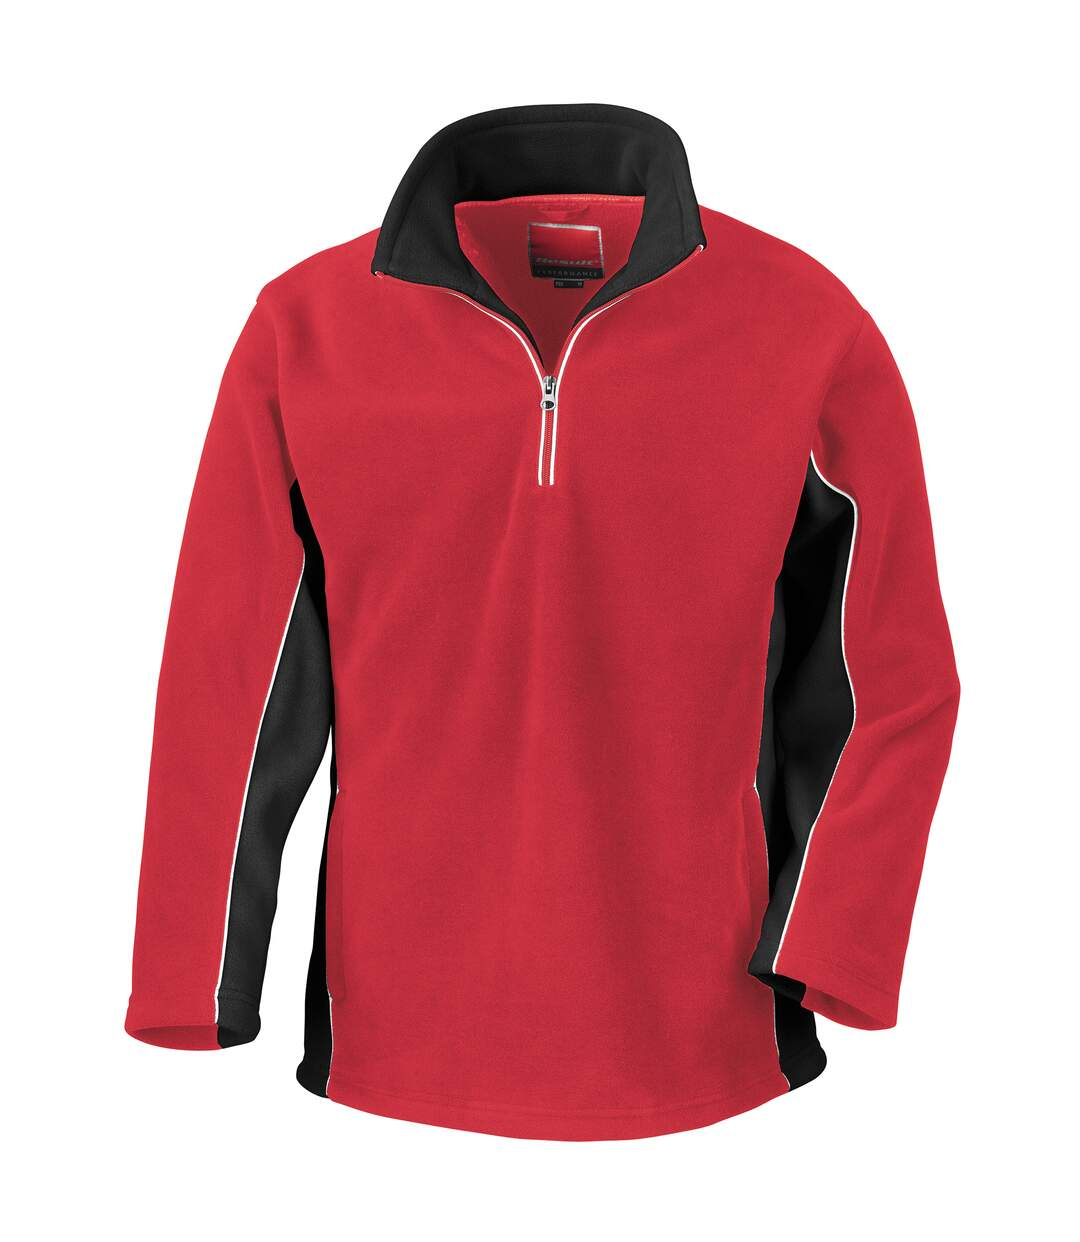 Result Mens Tech3 Sport Anti Pilling Windproof Breathable Fleece (Navy/Sky) - UTBC935